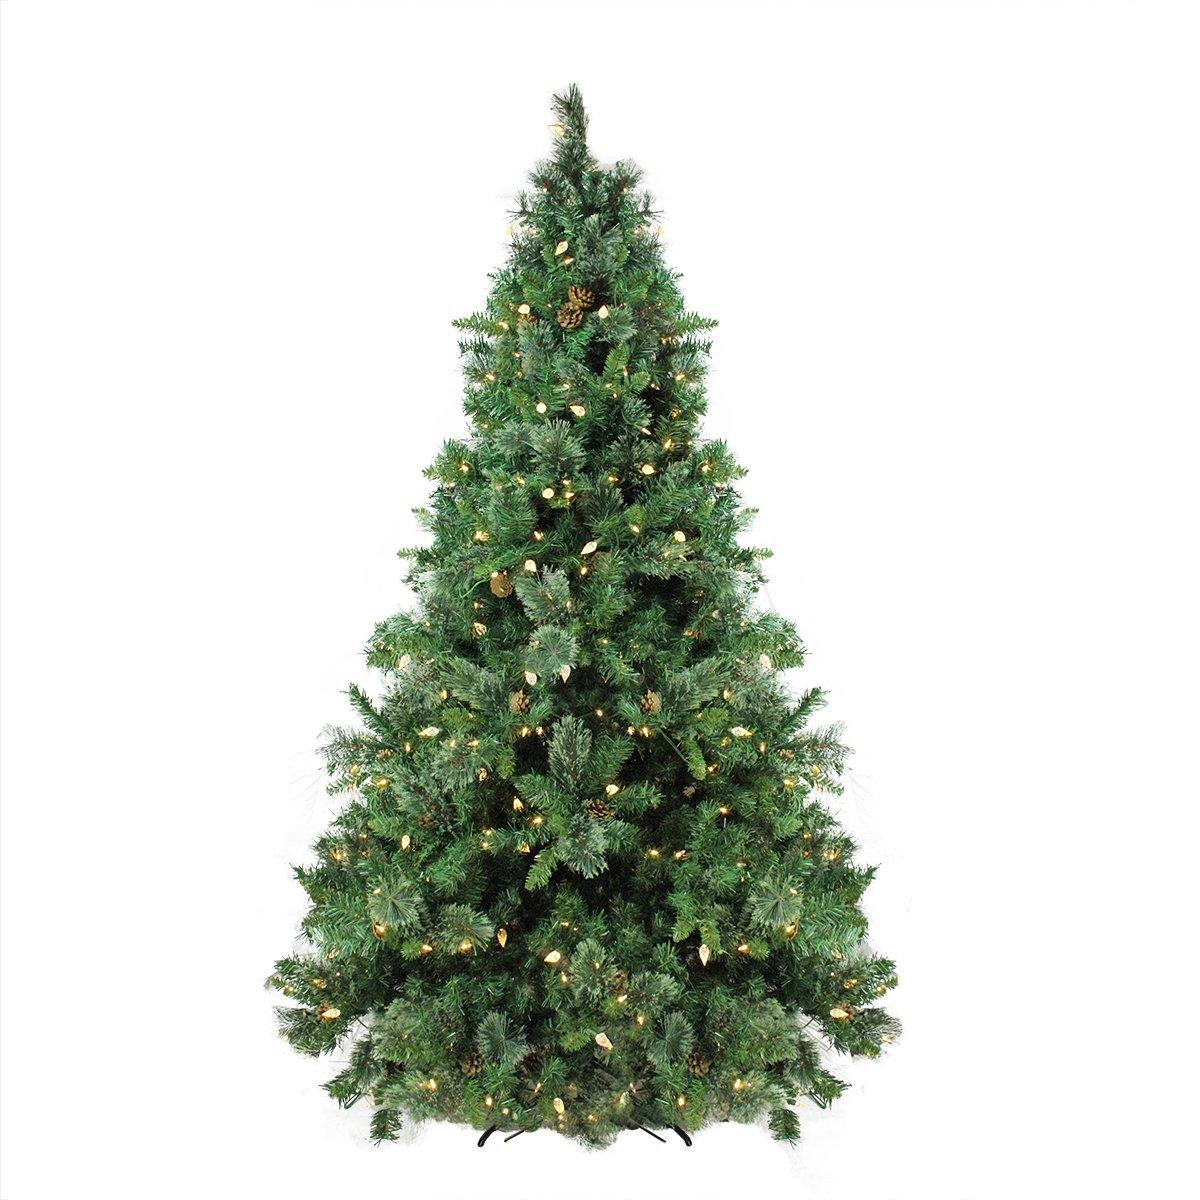 Amazon.com: Northlight Pre-Lit Single Plug Mixed Cashmere Pine Self ...